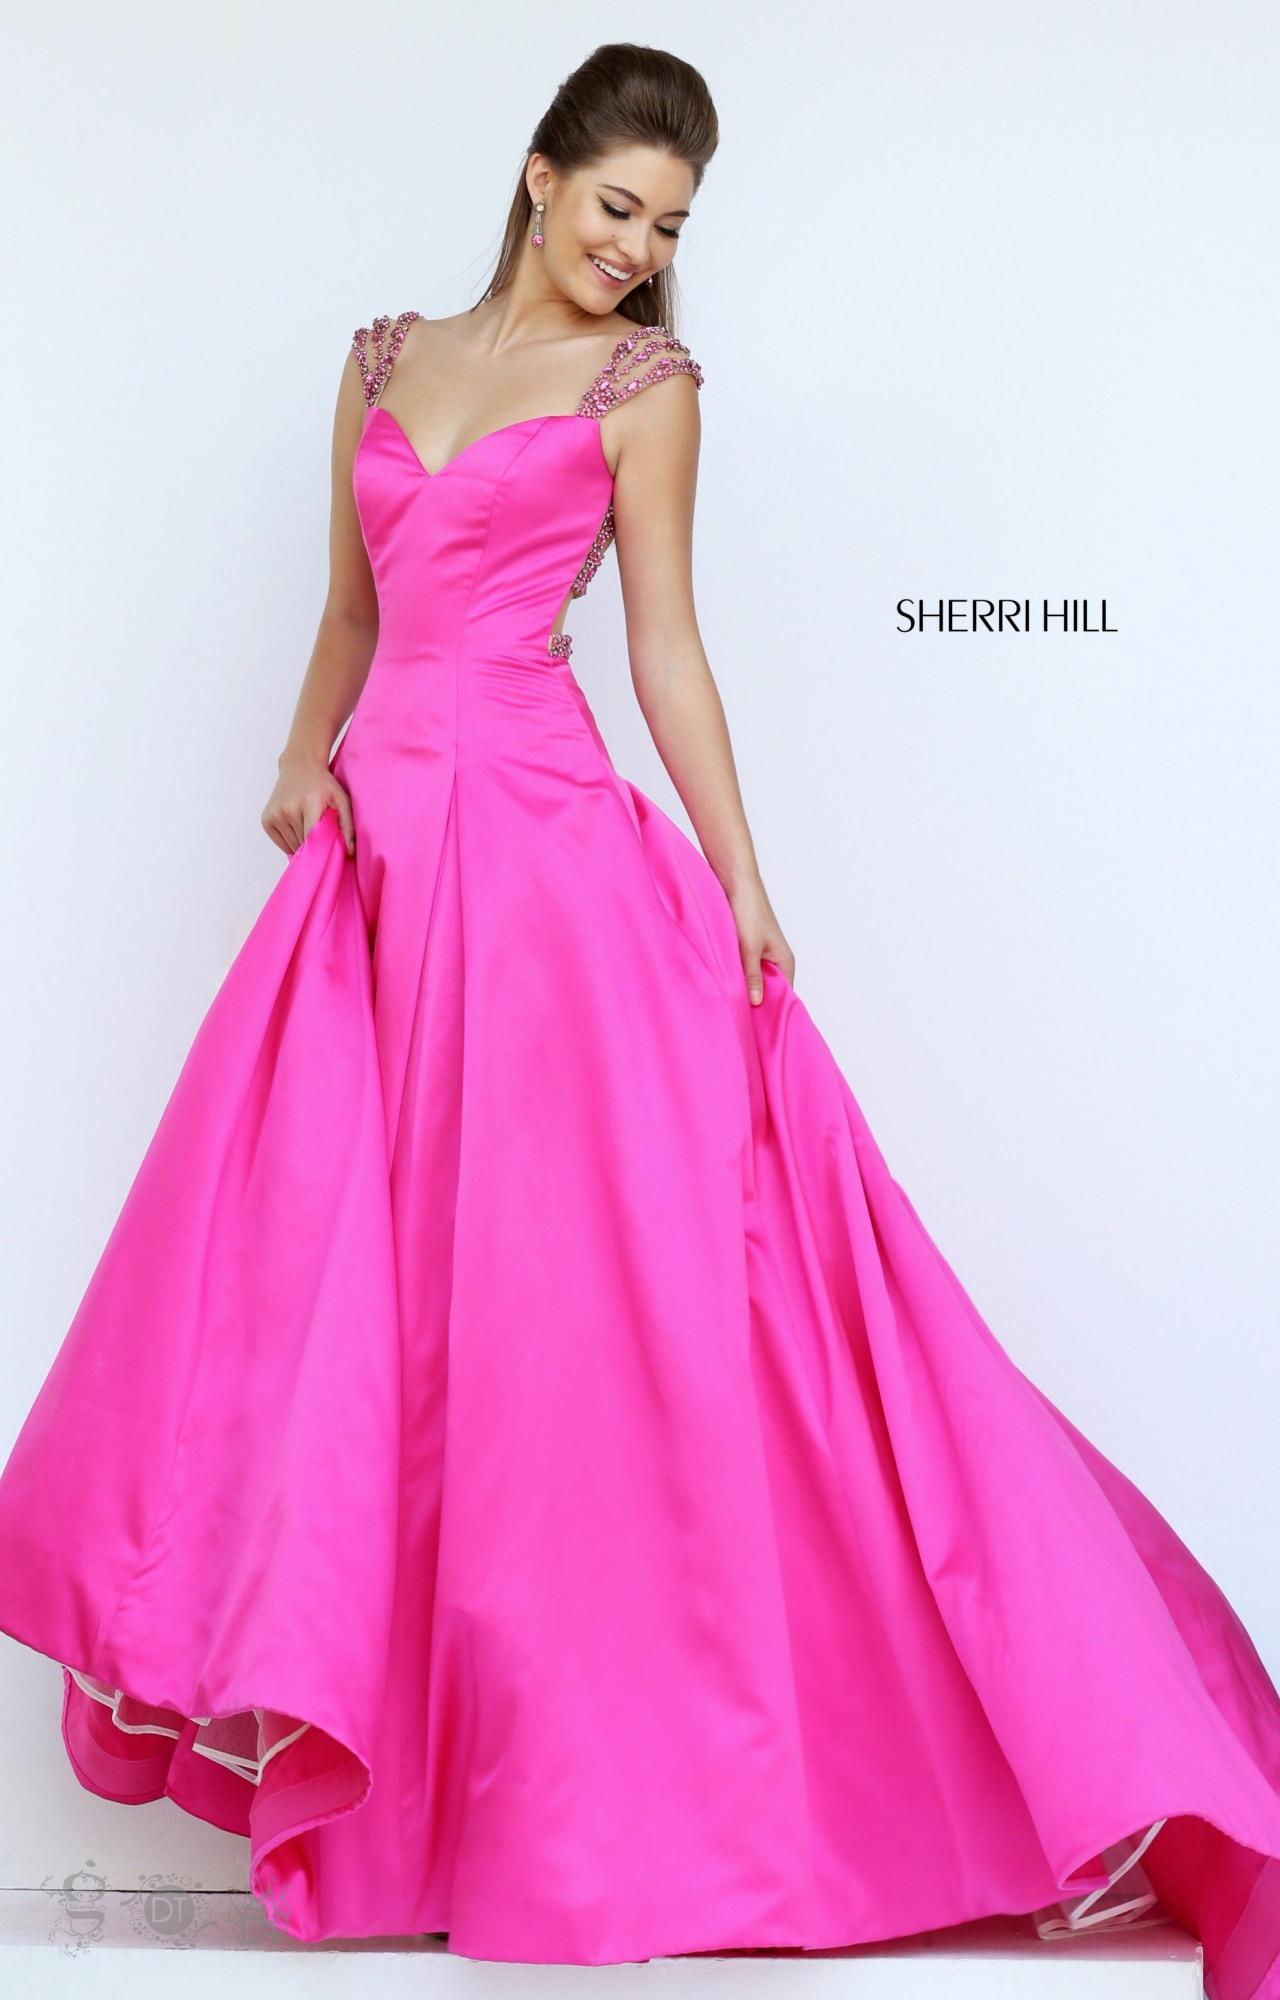 Sherri Hill 50229 Electra Gown Prom Dress